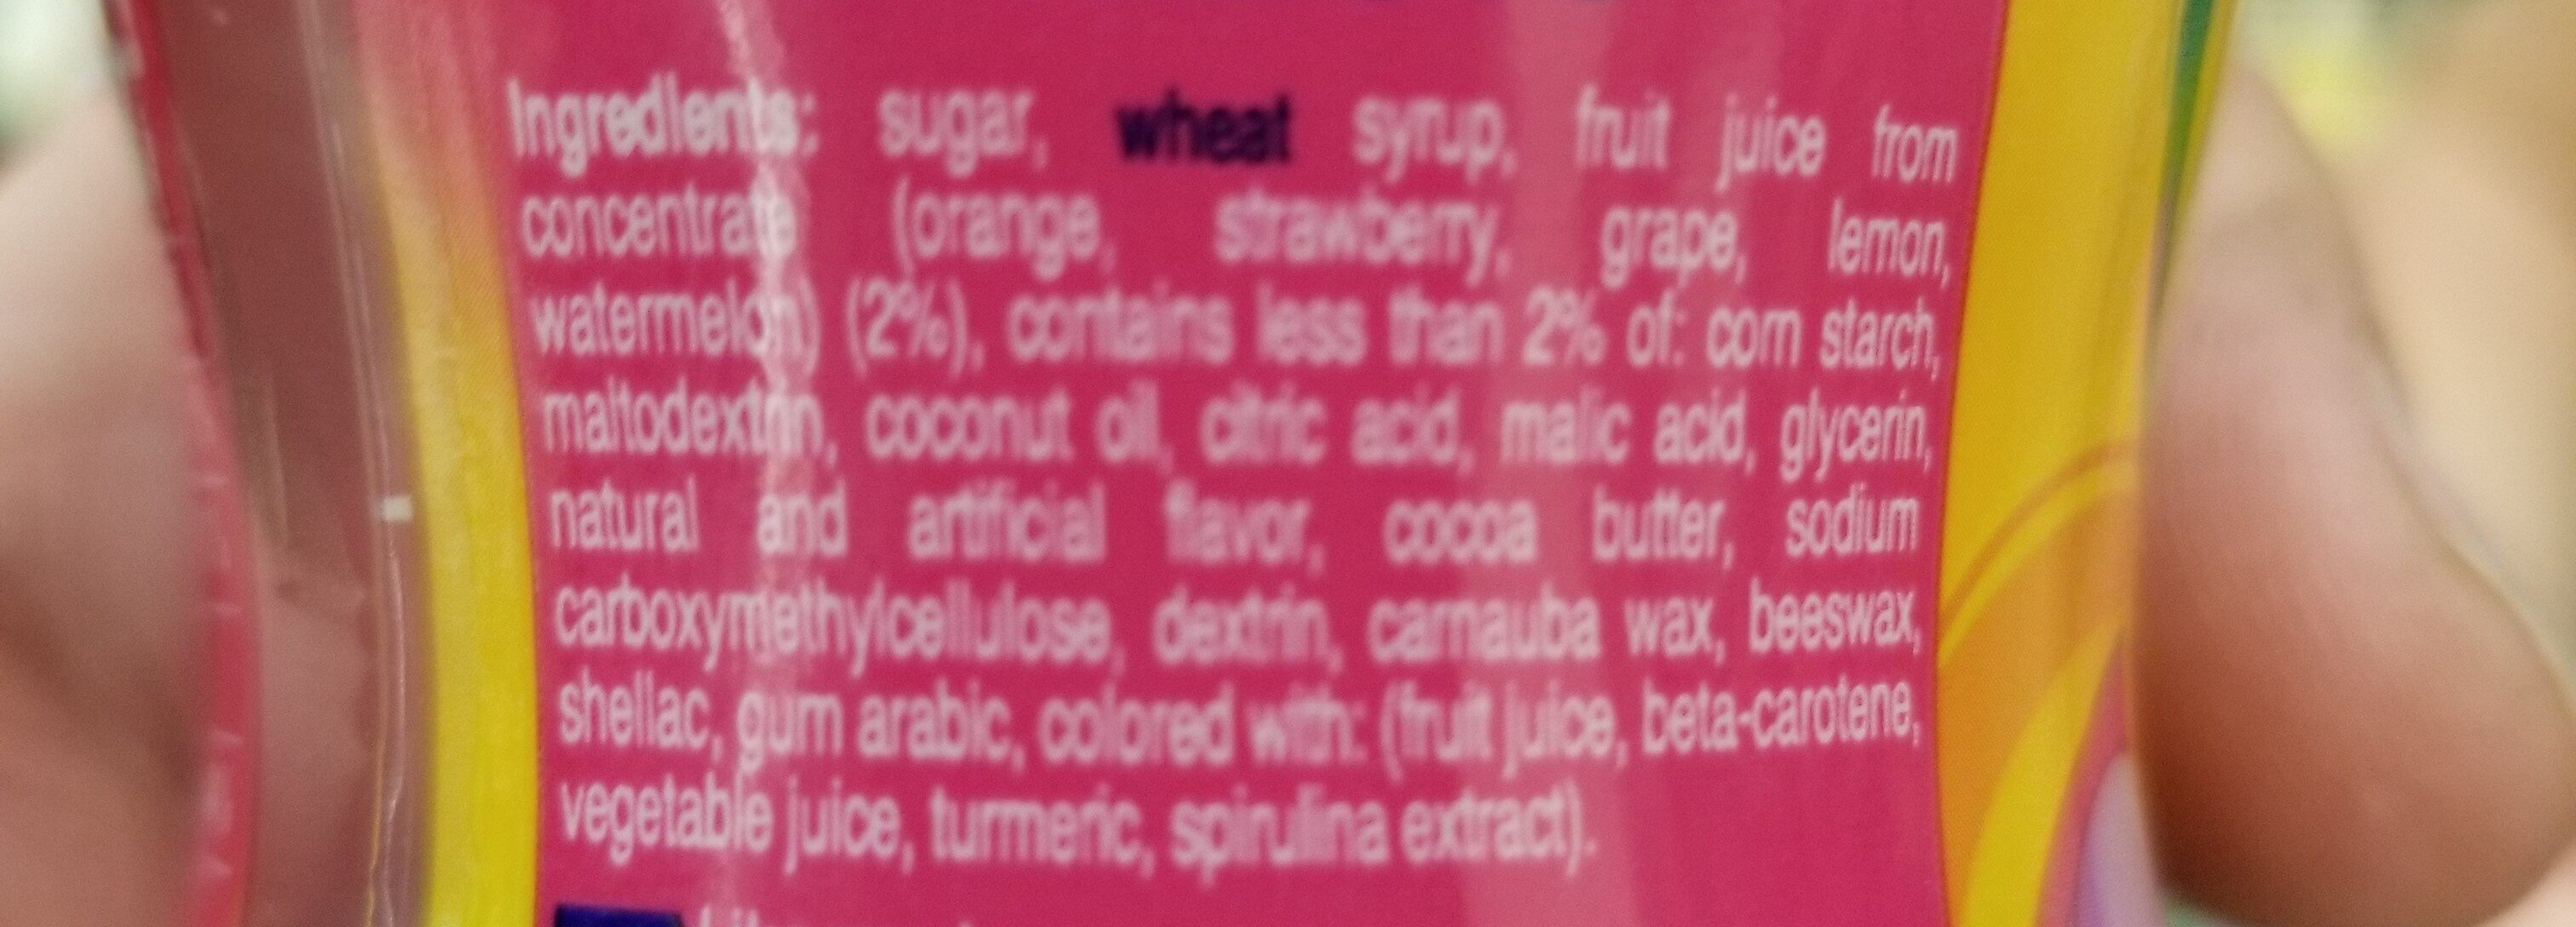 Mentos chewy mints - Ingredients - en